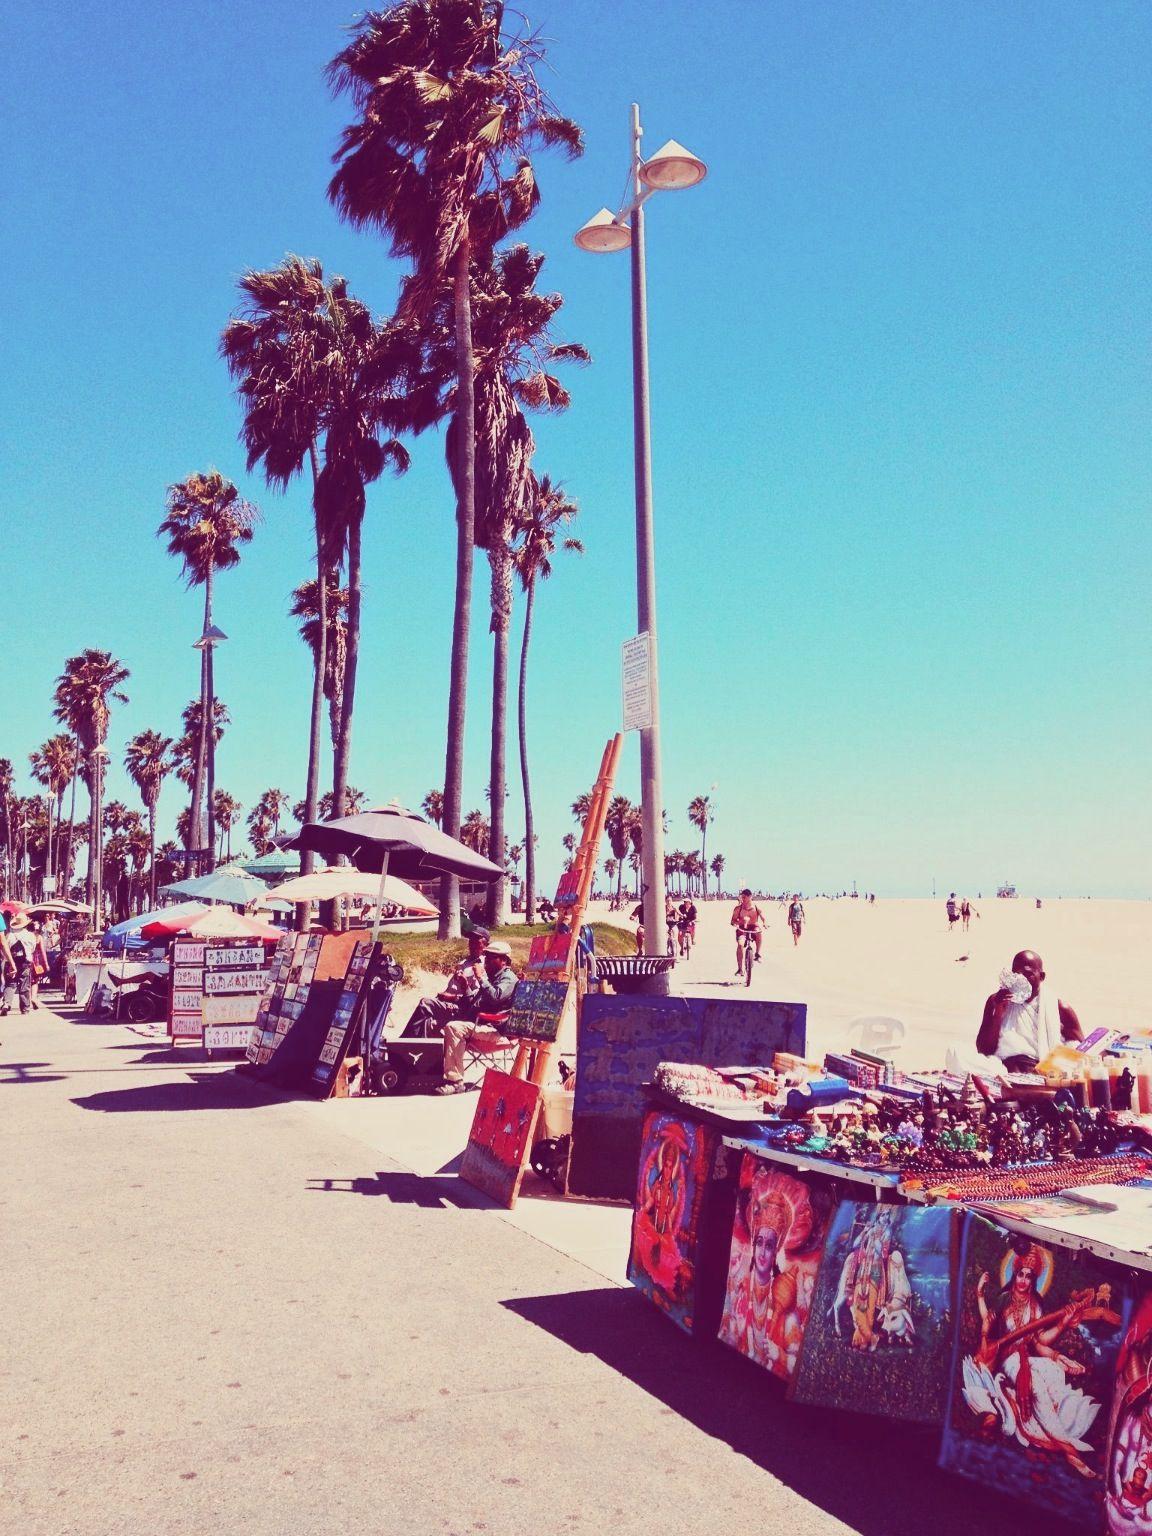 download image venice beach - photo #9